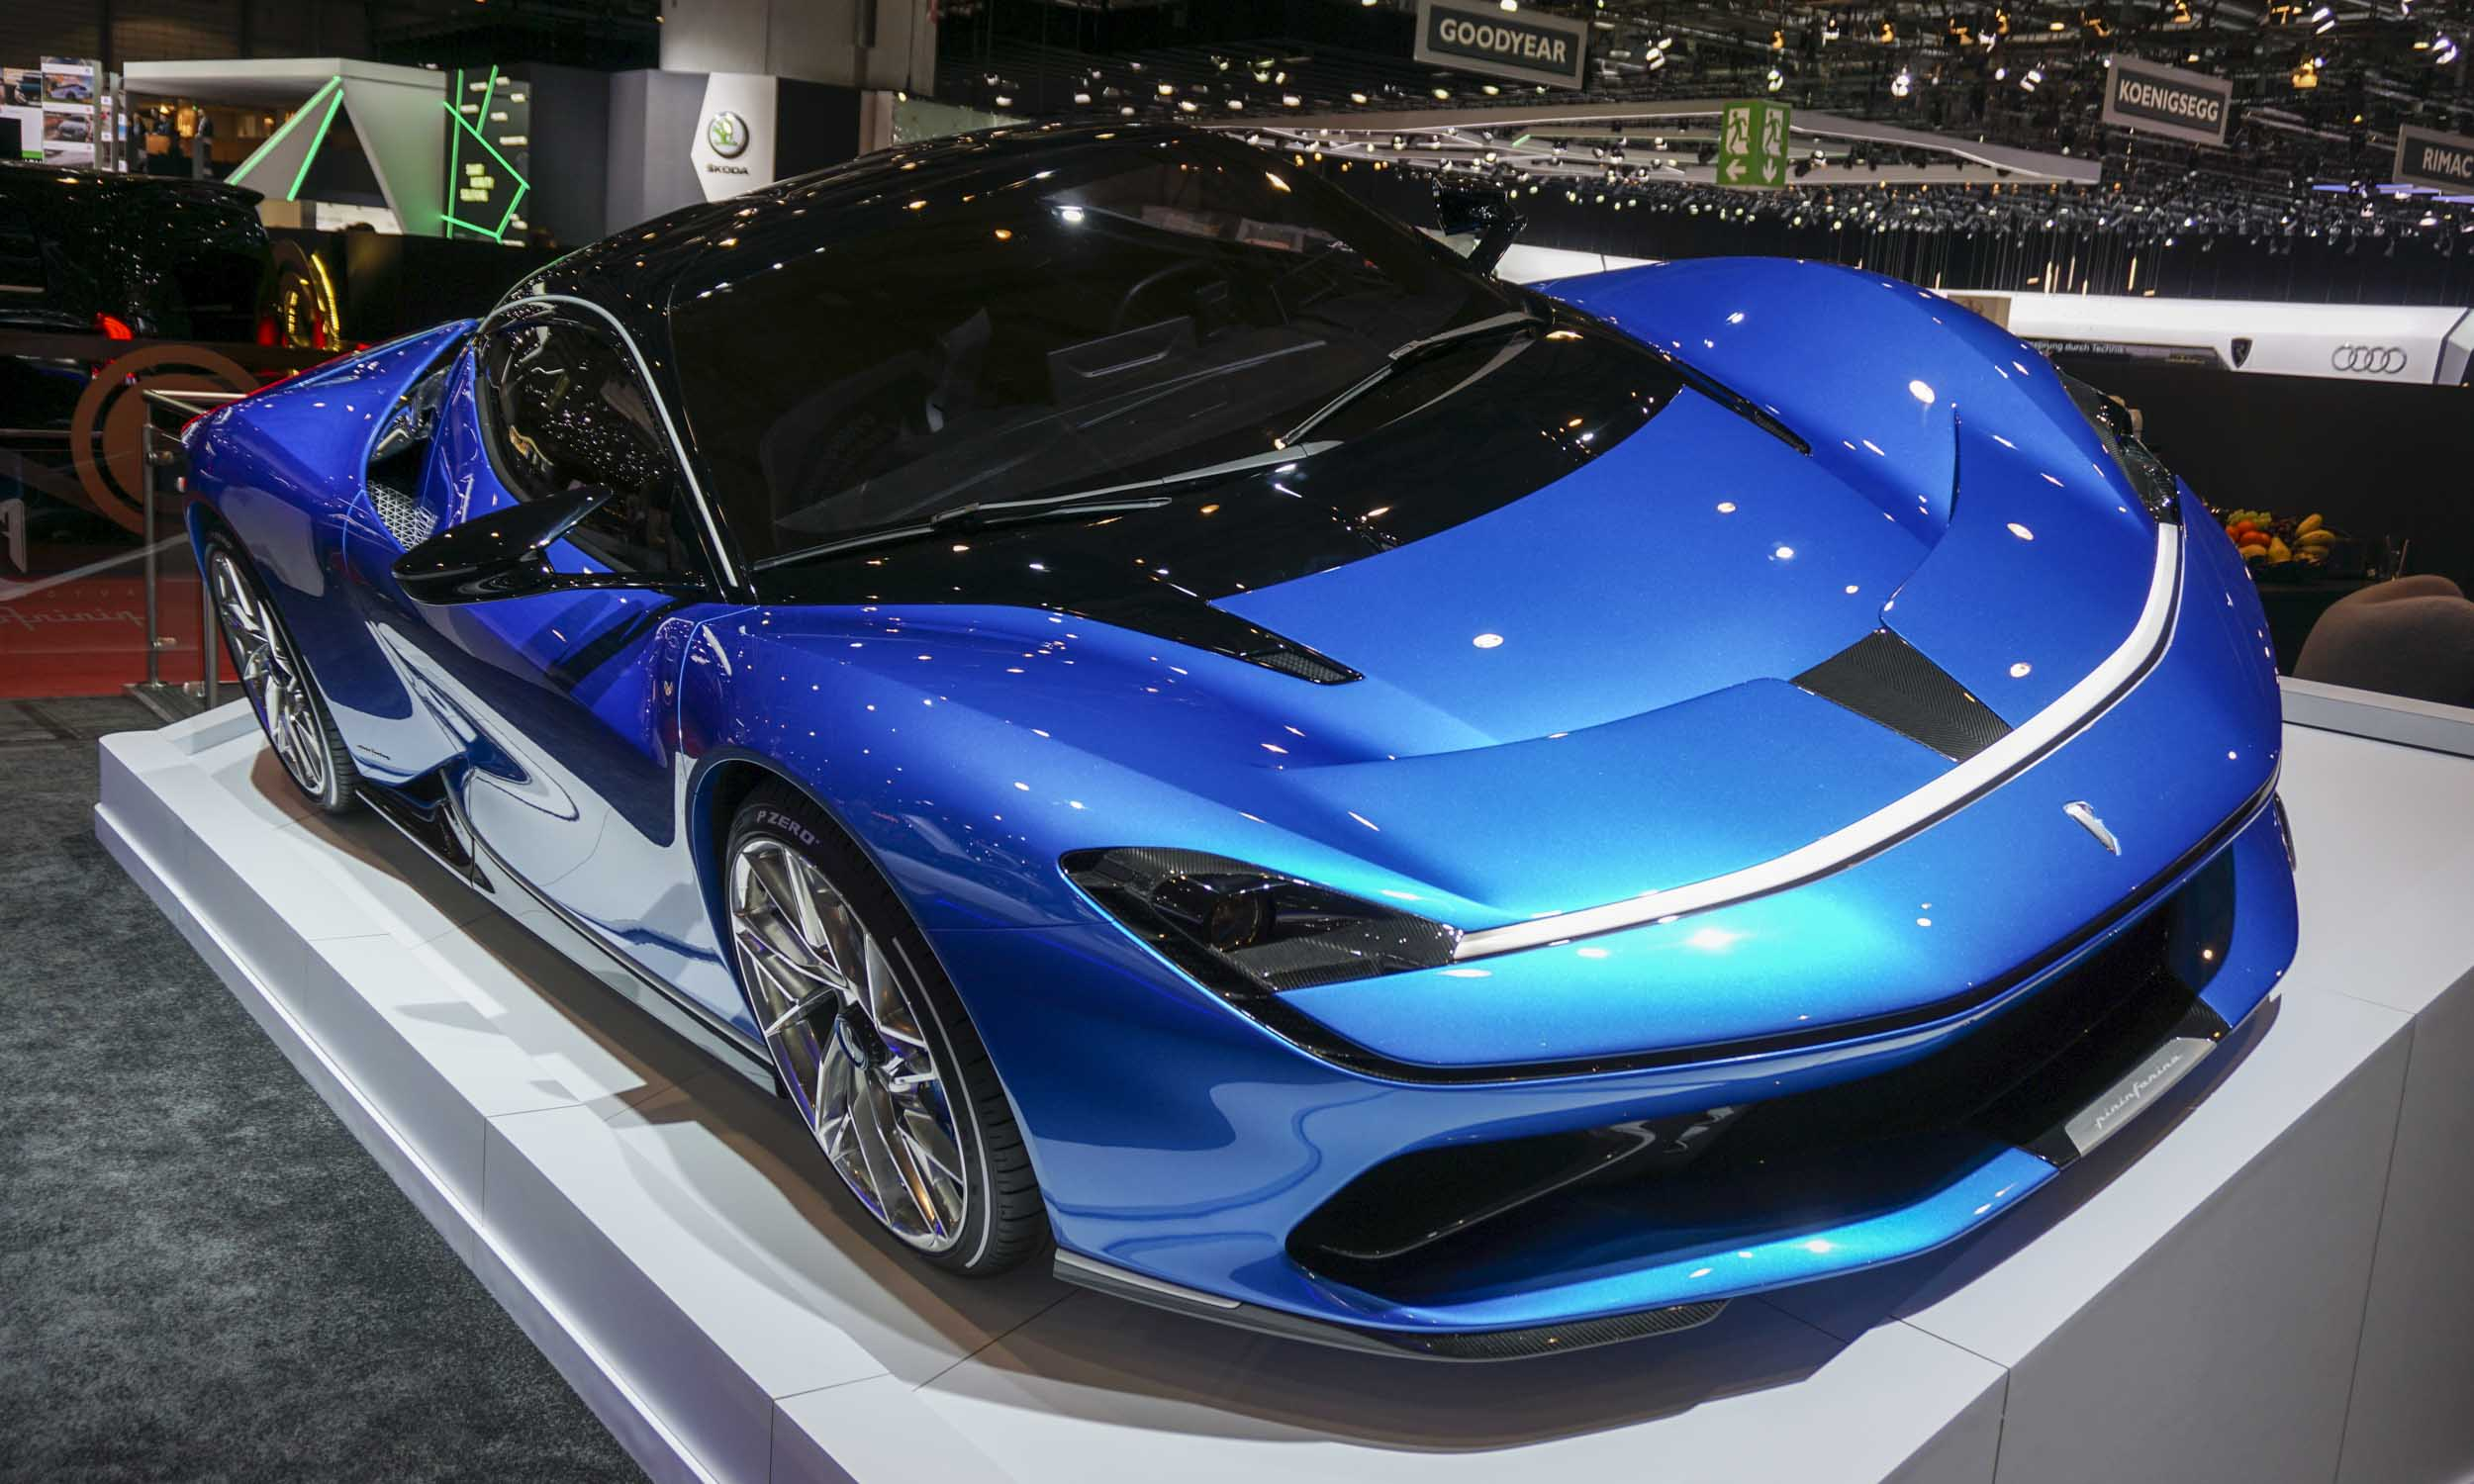 2019 Geneva Motor Show Photo Highlightsnbsp